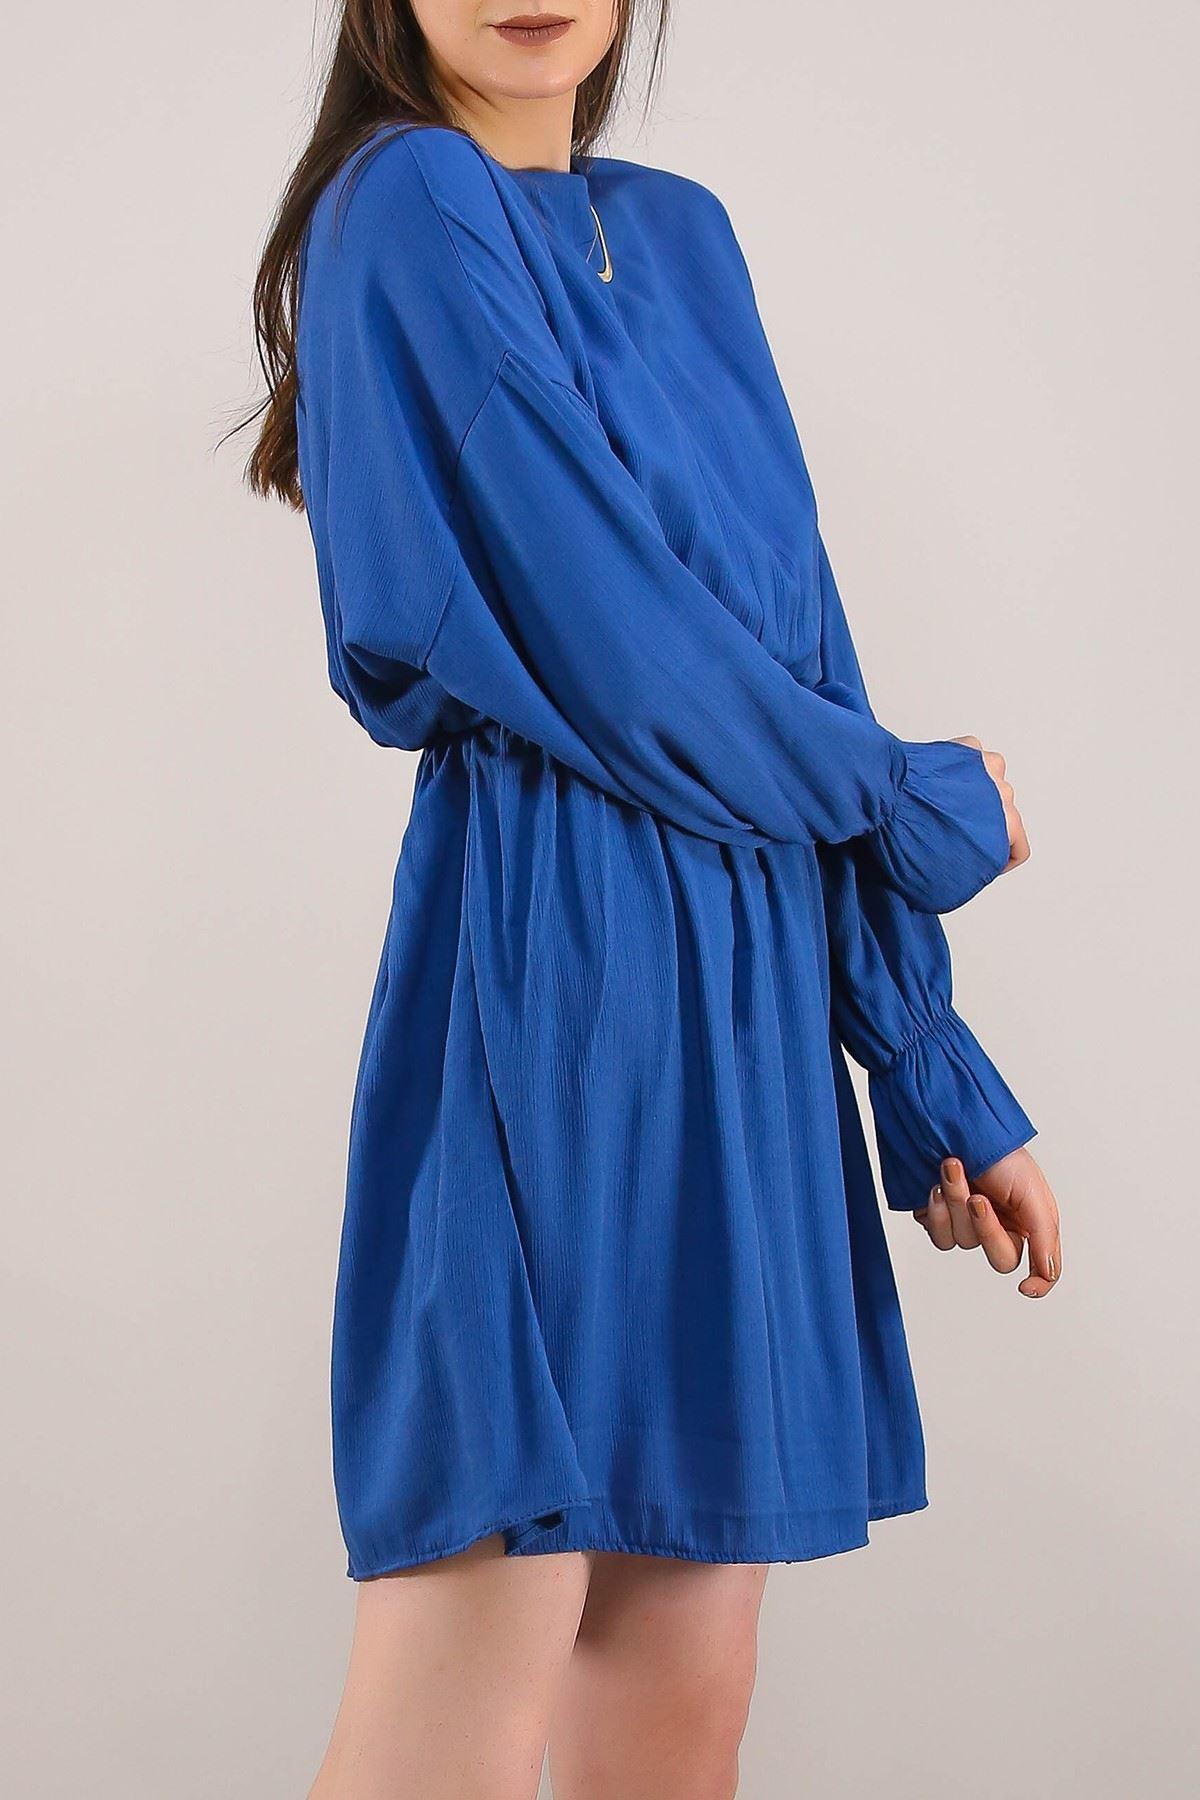 Dokuma Elbise Mavi - 5071.701.